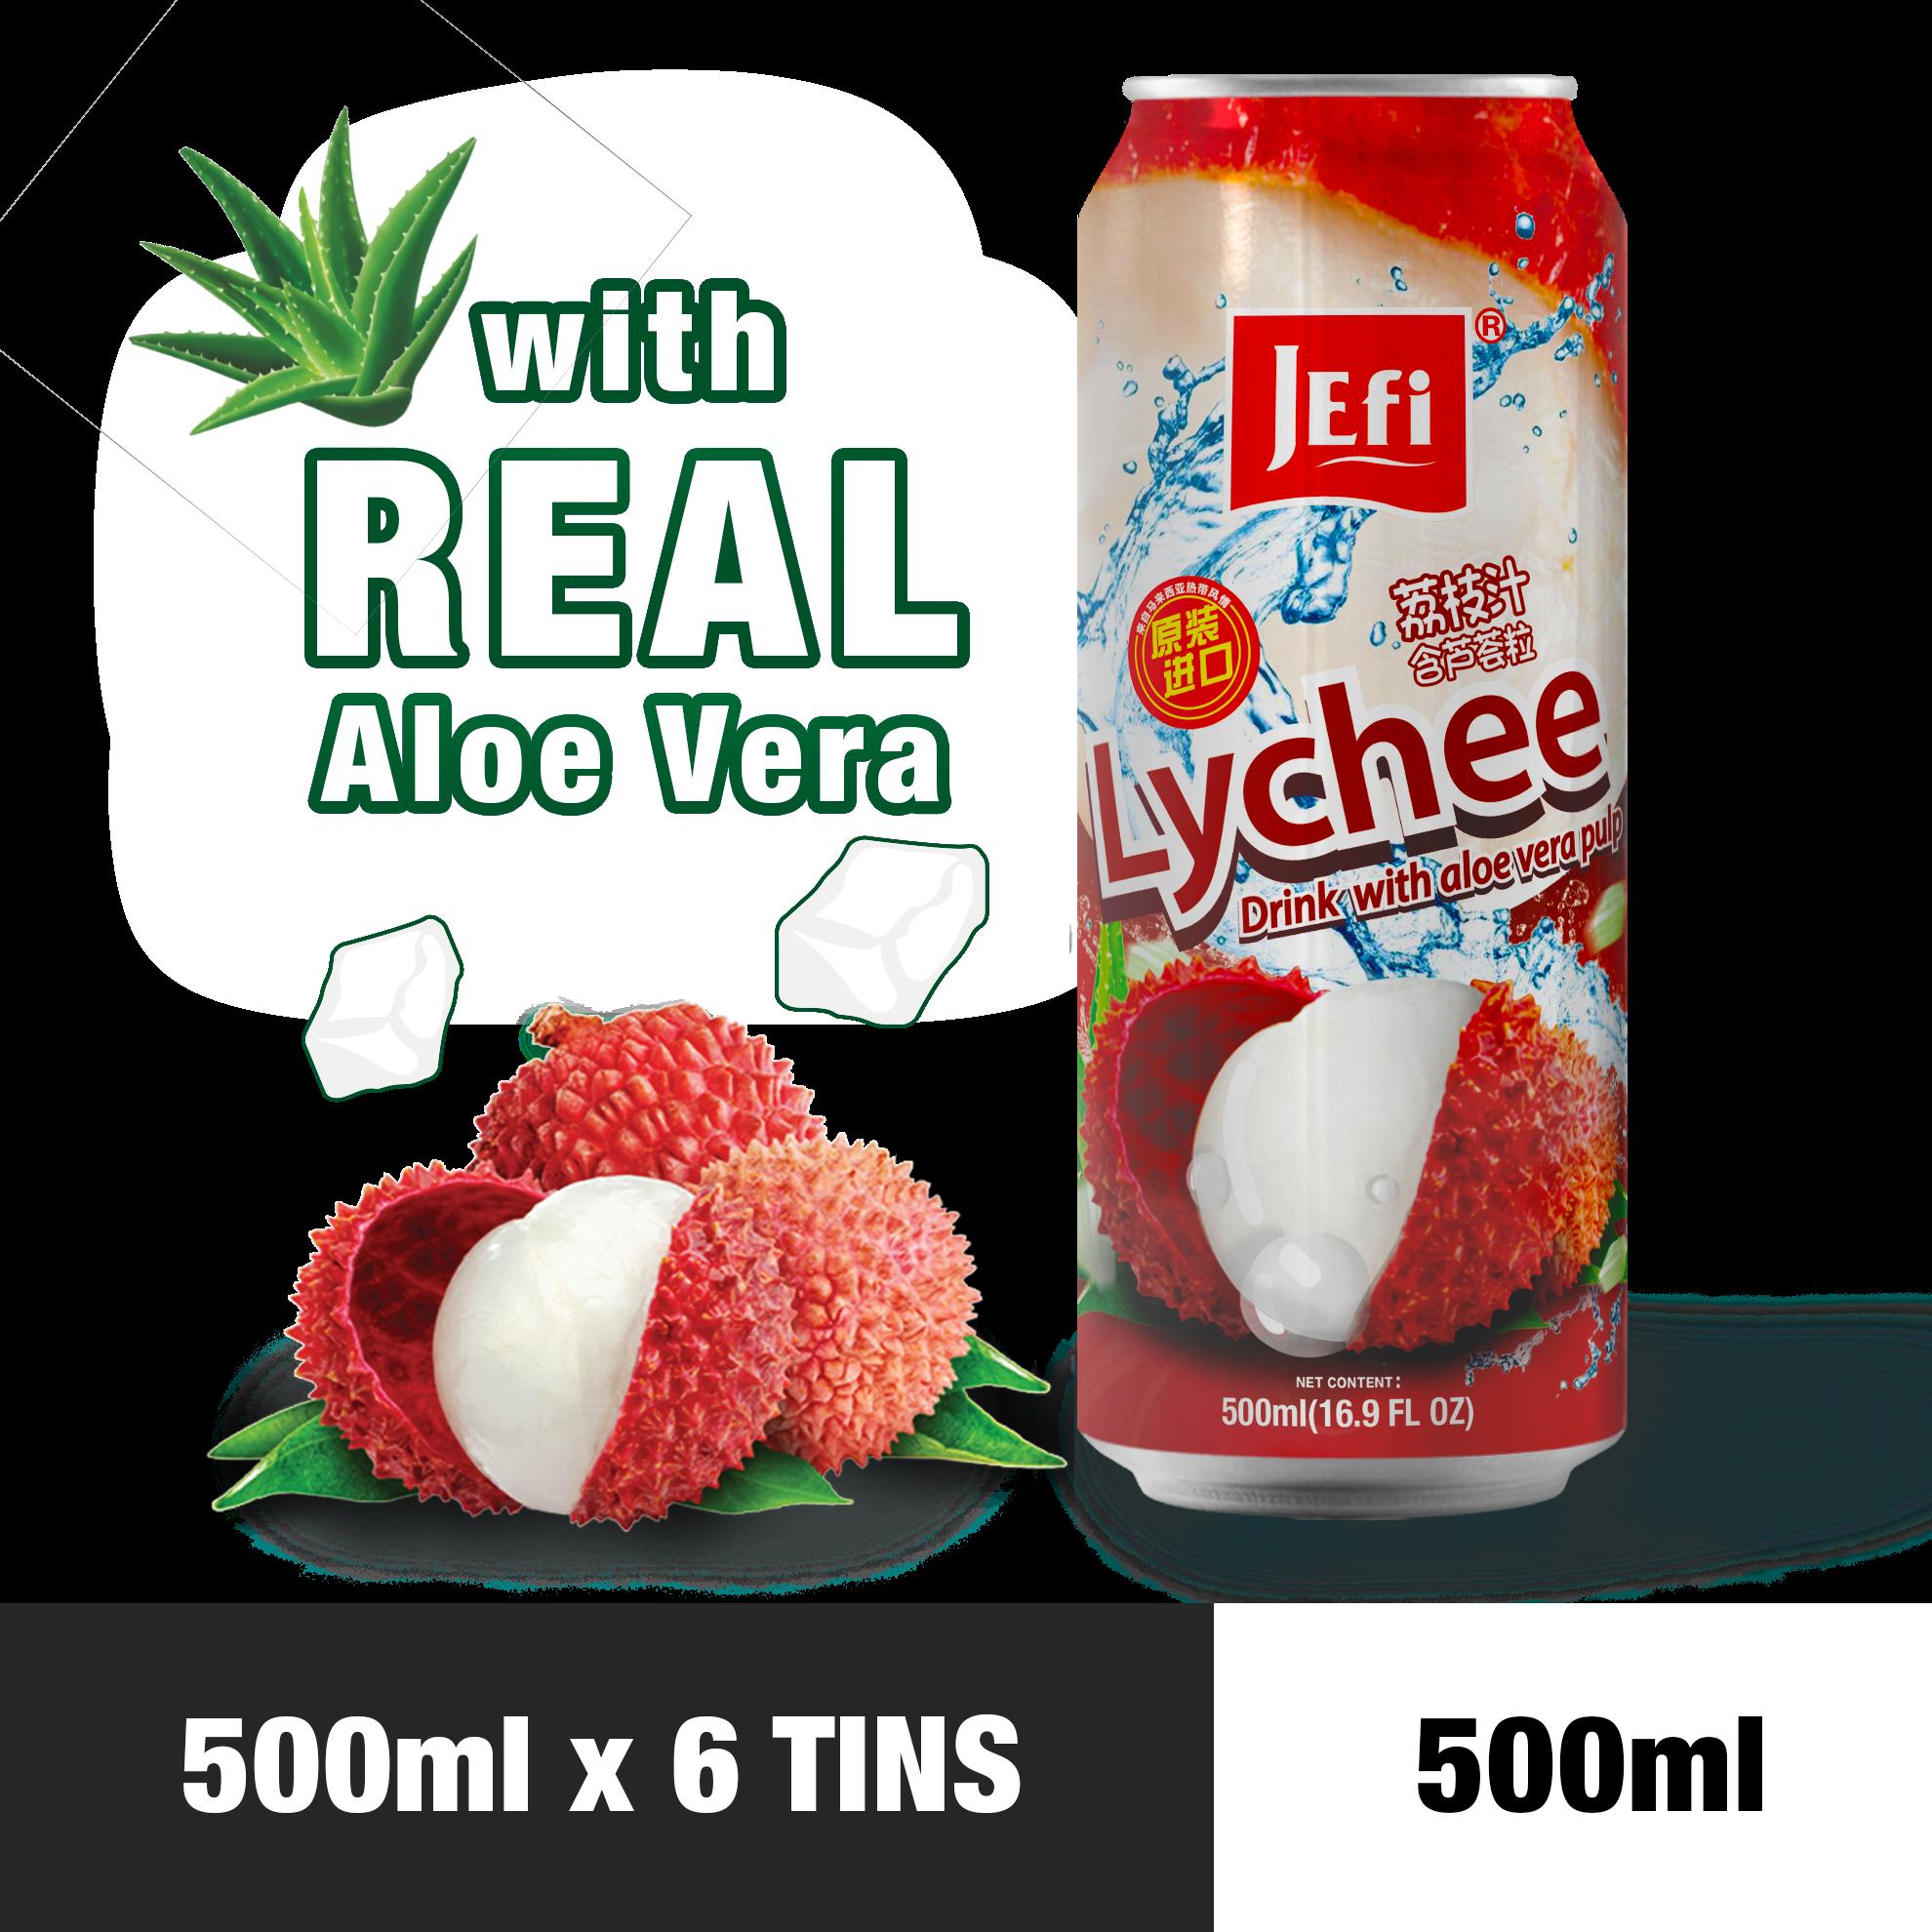 JEFI Lychee Drink with Aloe Vera Pulp (500ml x 6tins)